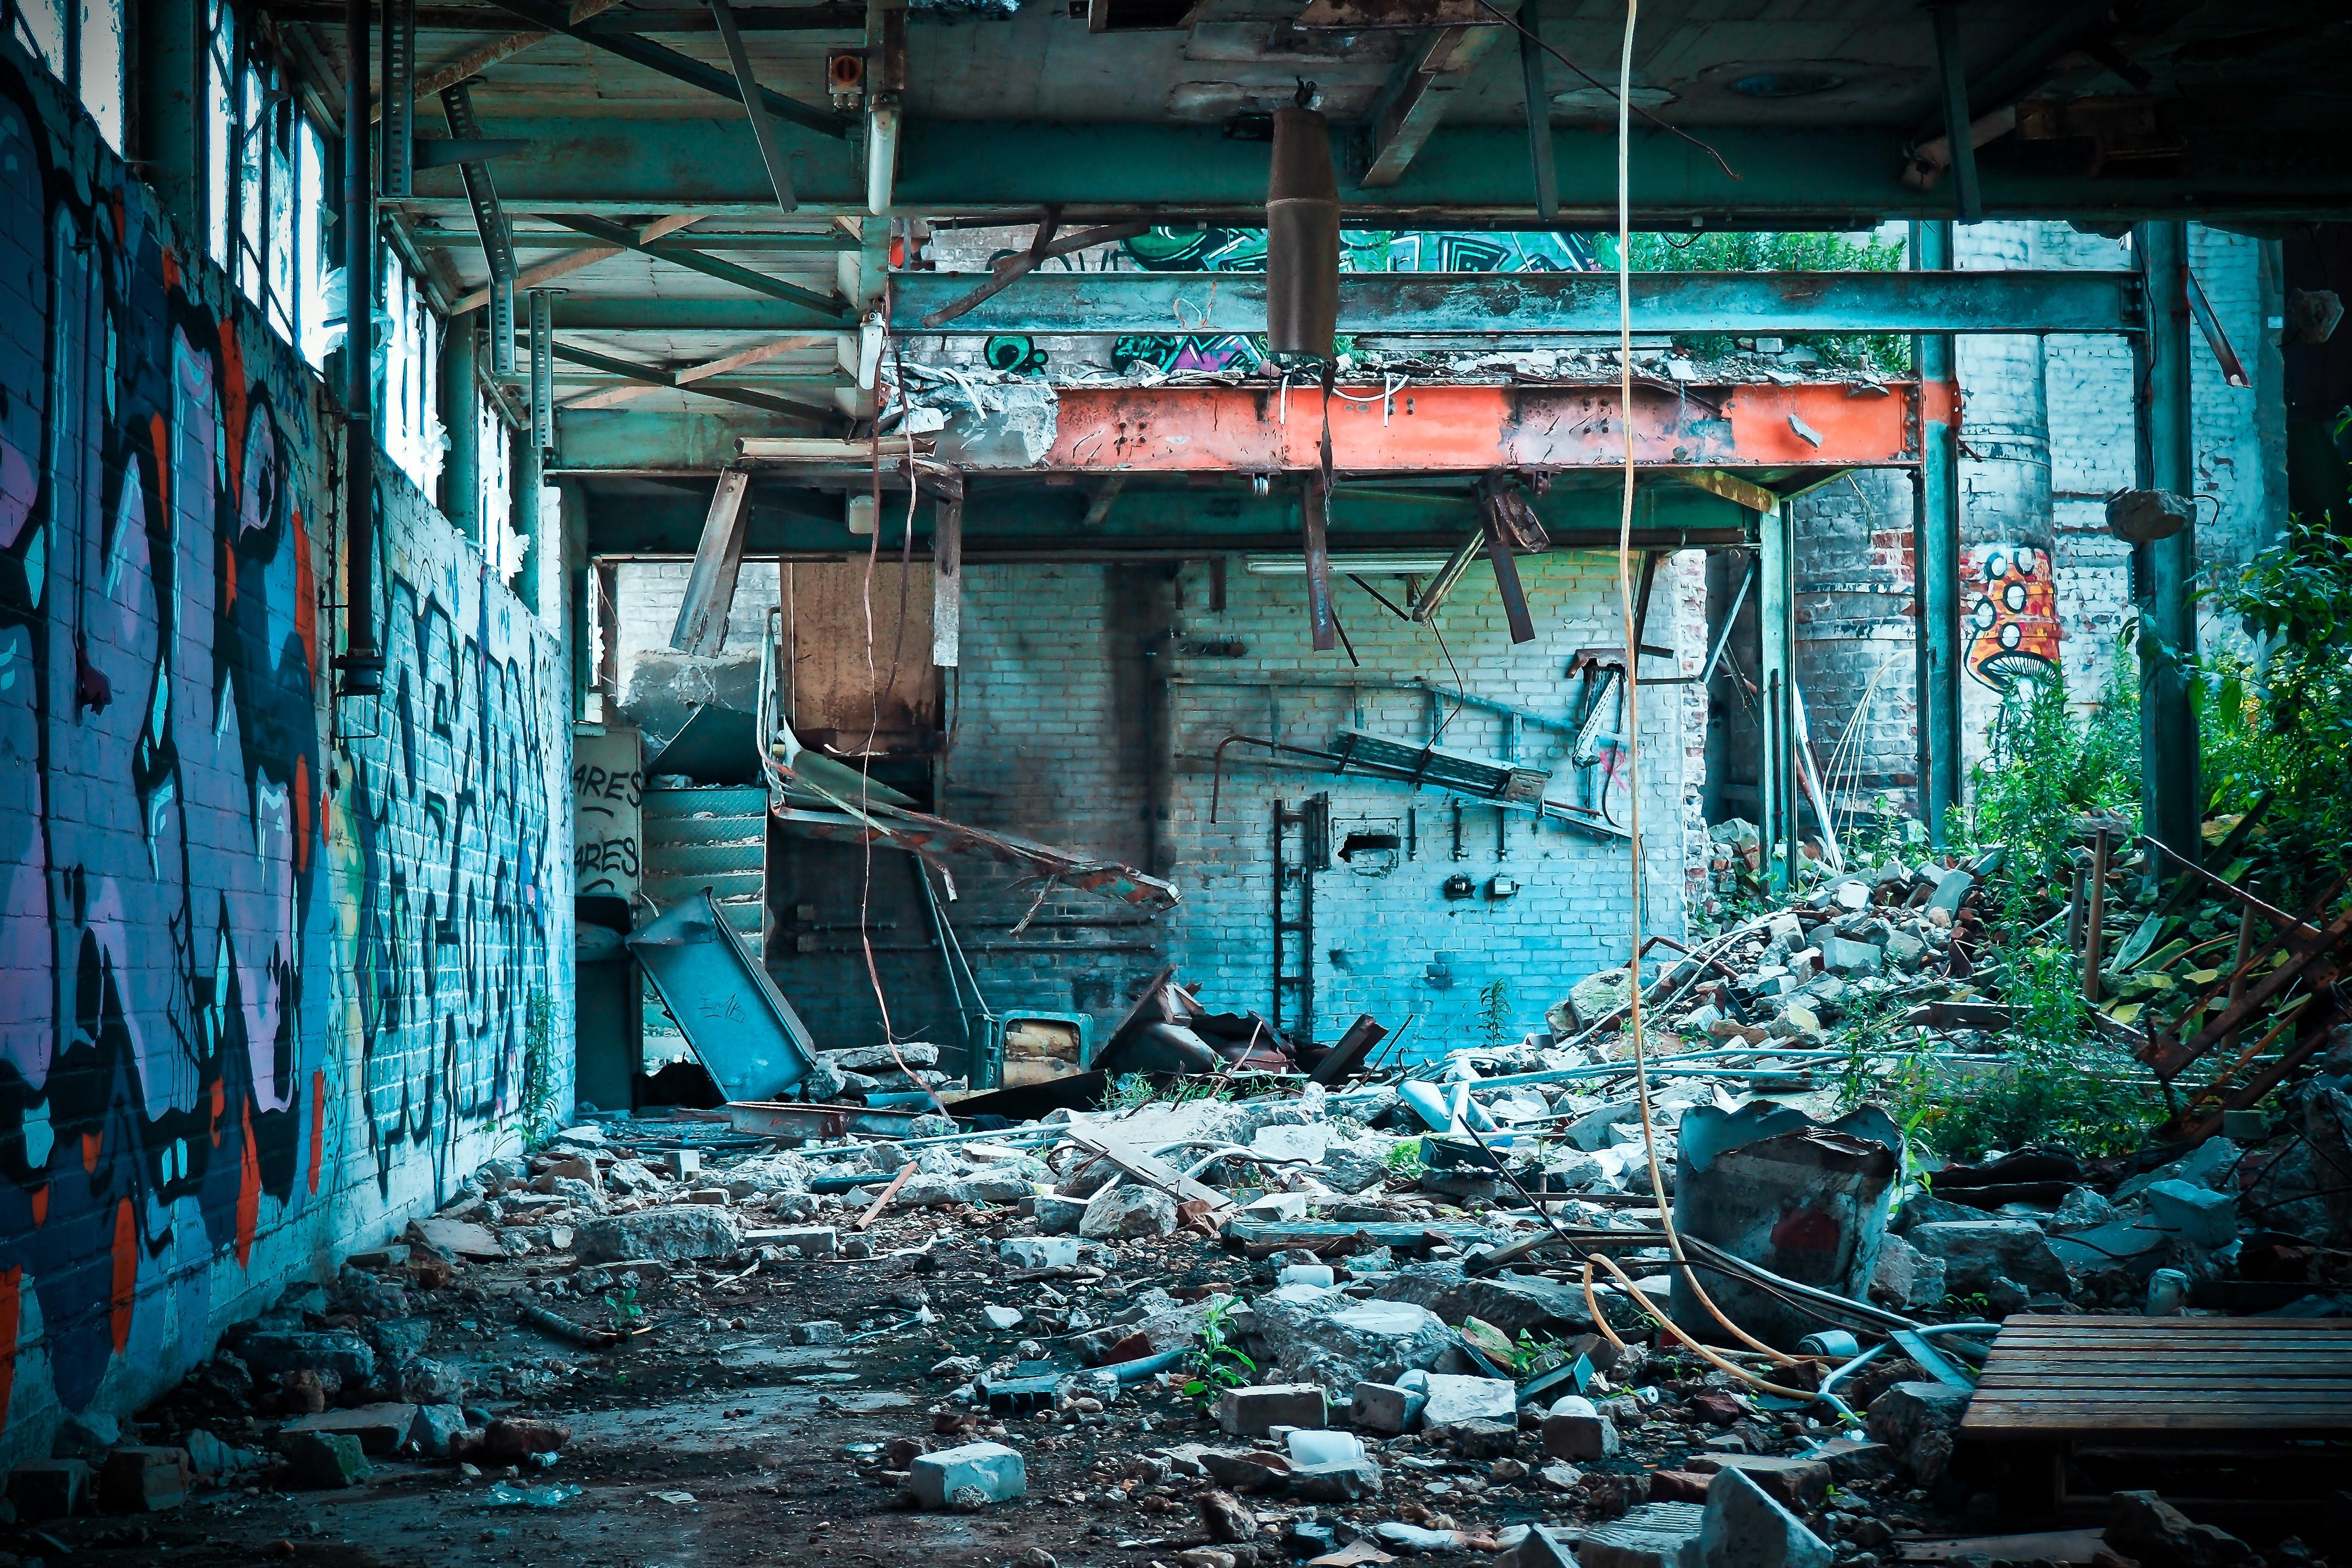 Abandon Concrete Building during Daytime, Street art, Vandalism, Rocks, Graffiti, HQ Photo